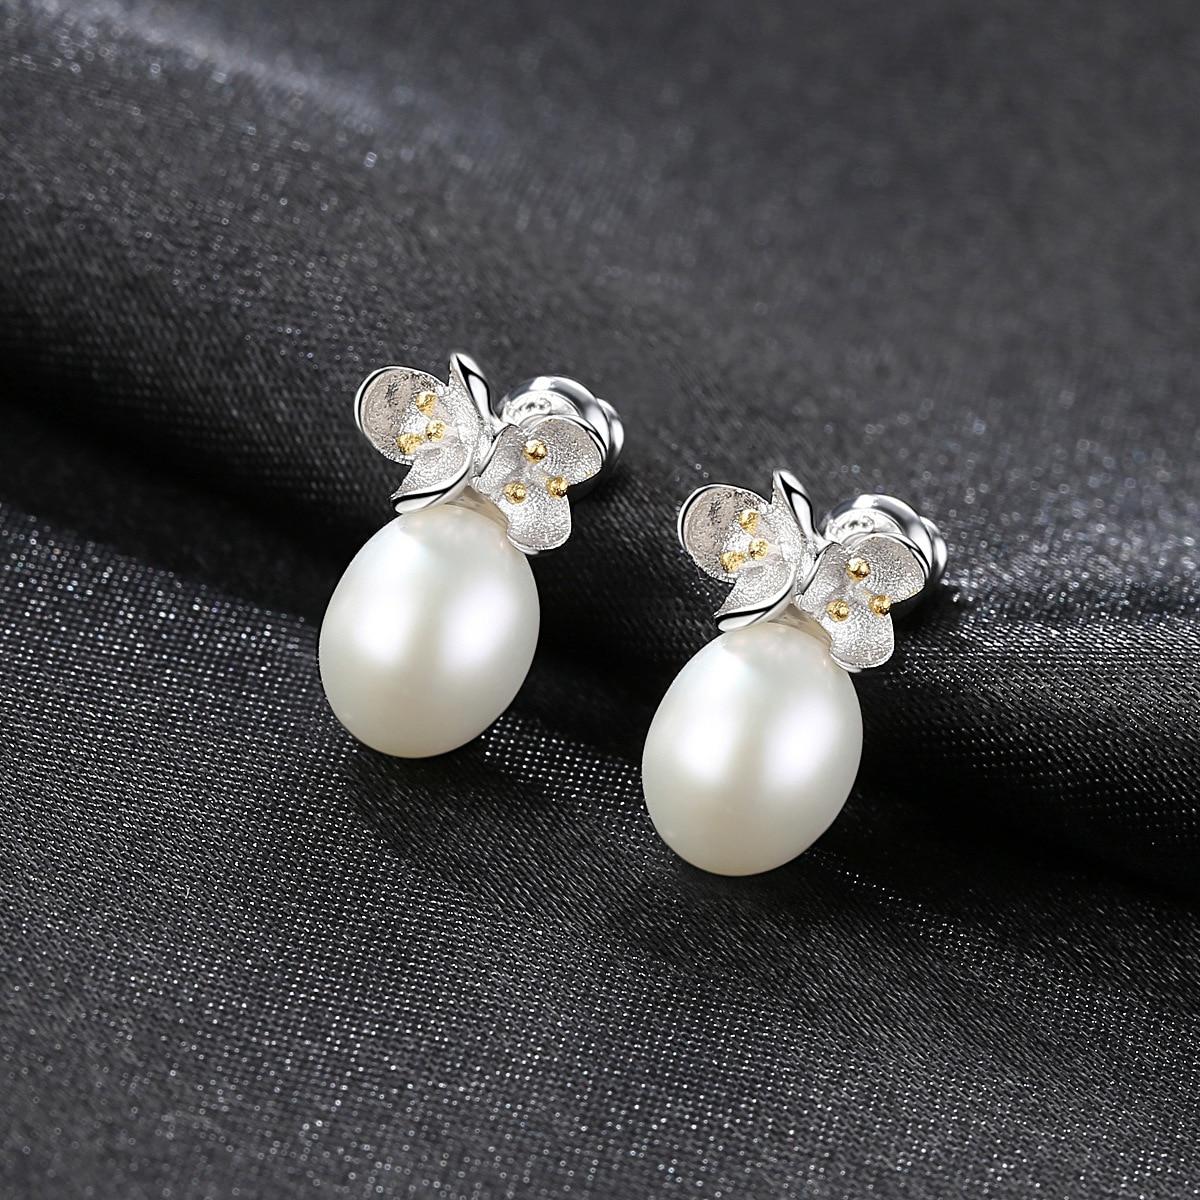 YUEYIN 925 Sterling Silver Earrings 8 9mm Real Pearl Earrings Korean Flower Earrings Simple Style High Quality Charming Hot Sale in Earrings from Jewelry Accessories